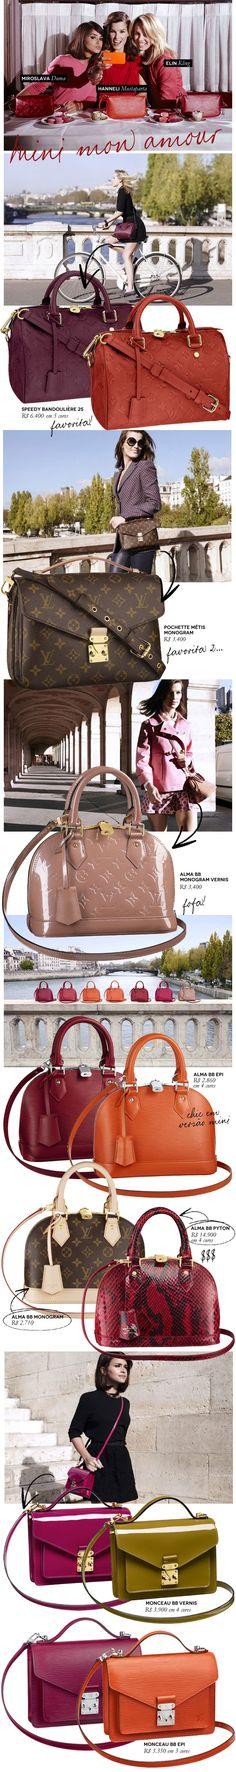 fashion-gazette-barbara-resende-wish-louis-vuitton-mini-bags